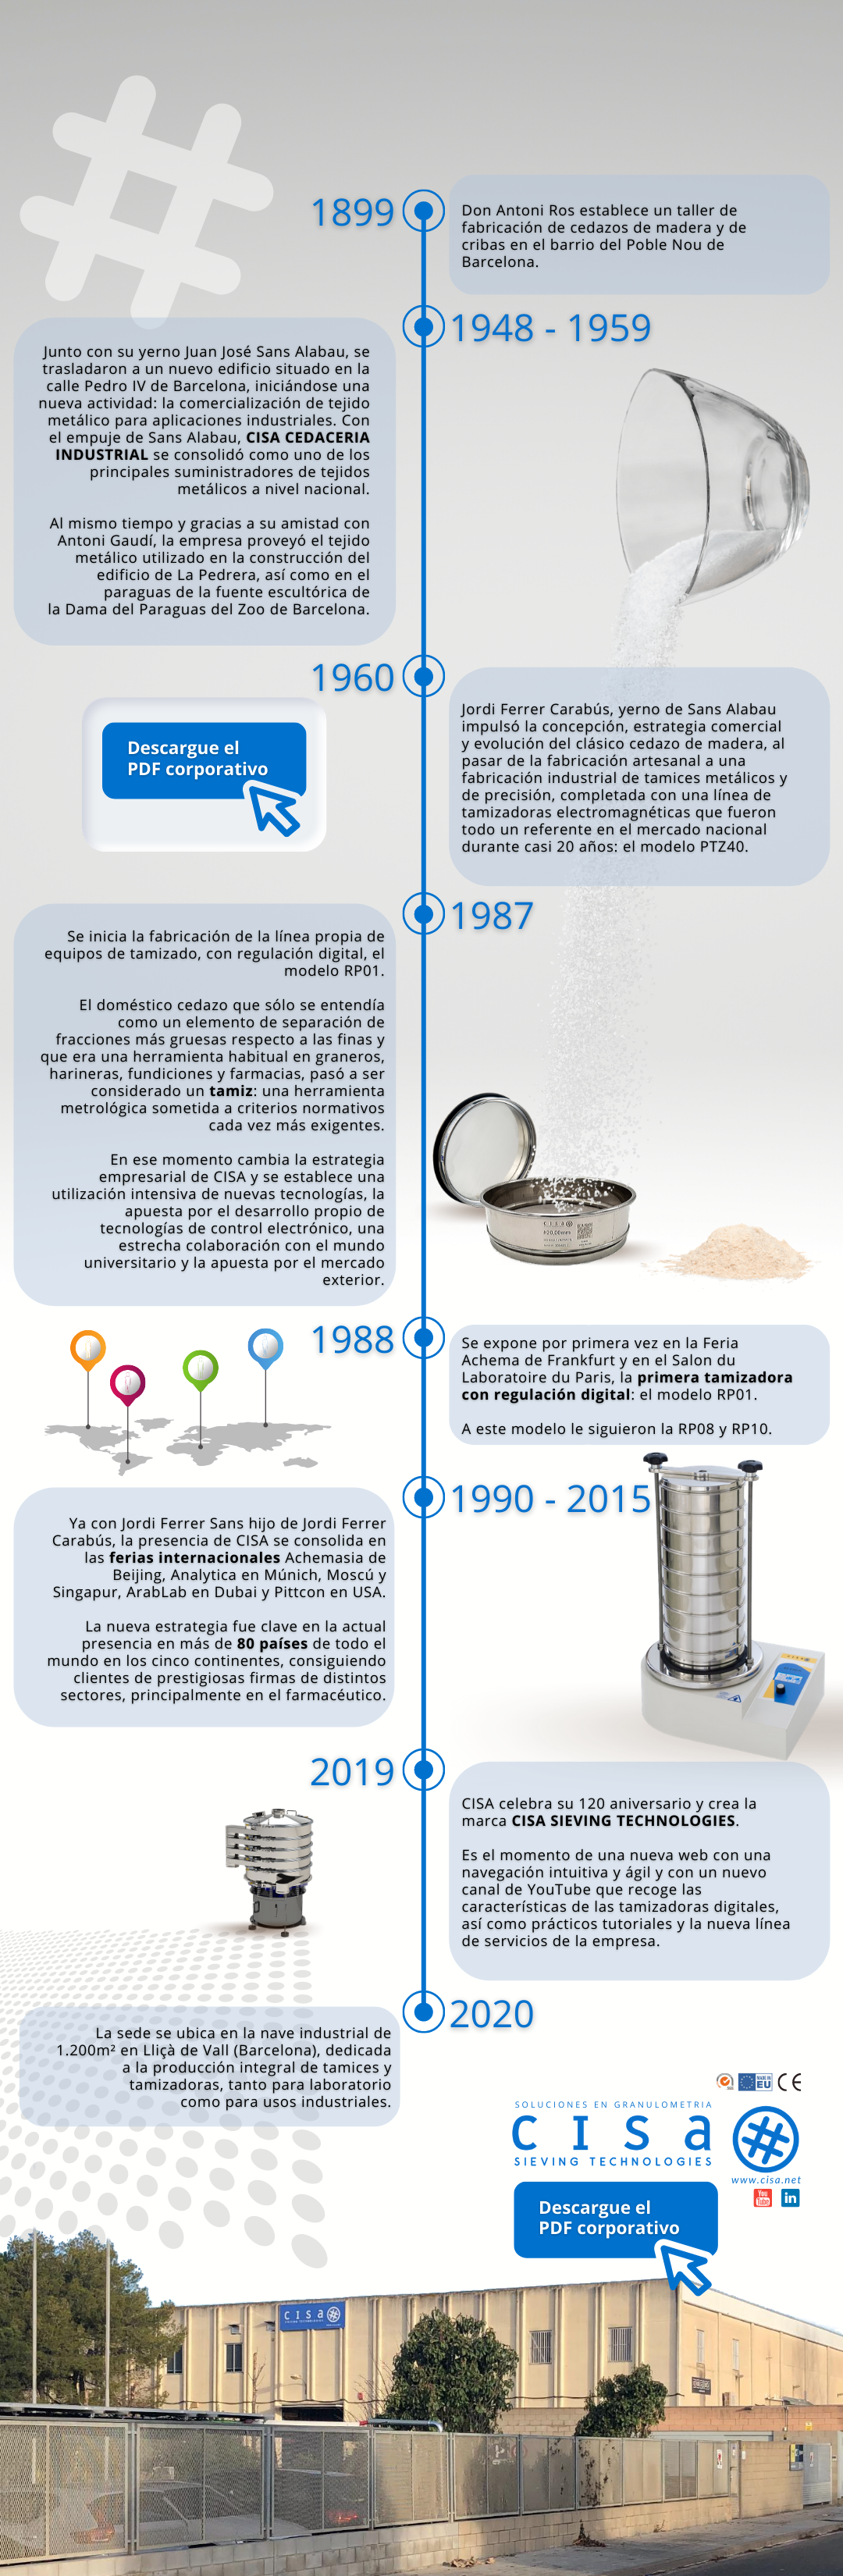 Historia CISA Sieving Technologies